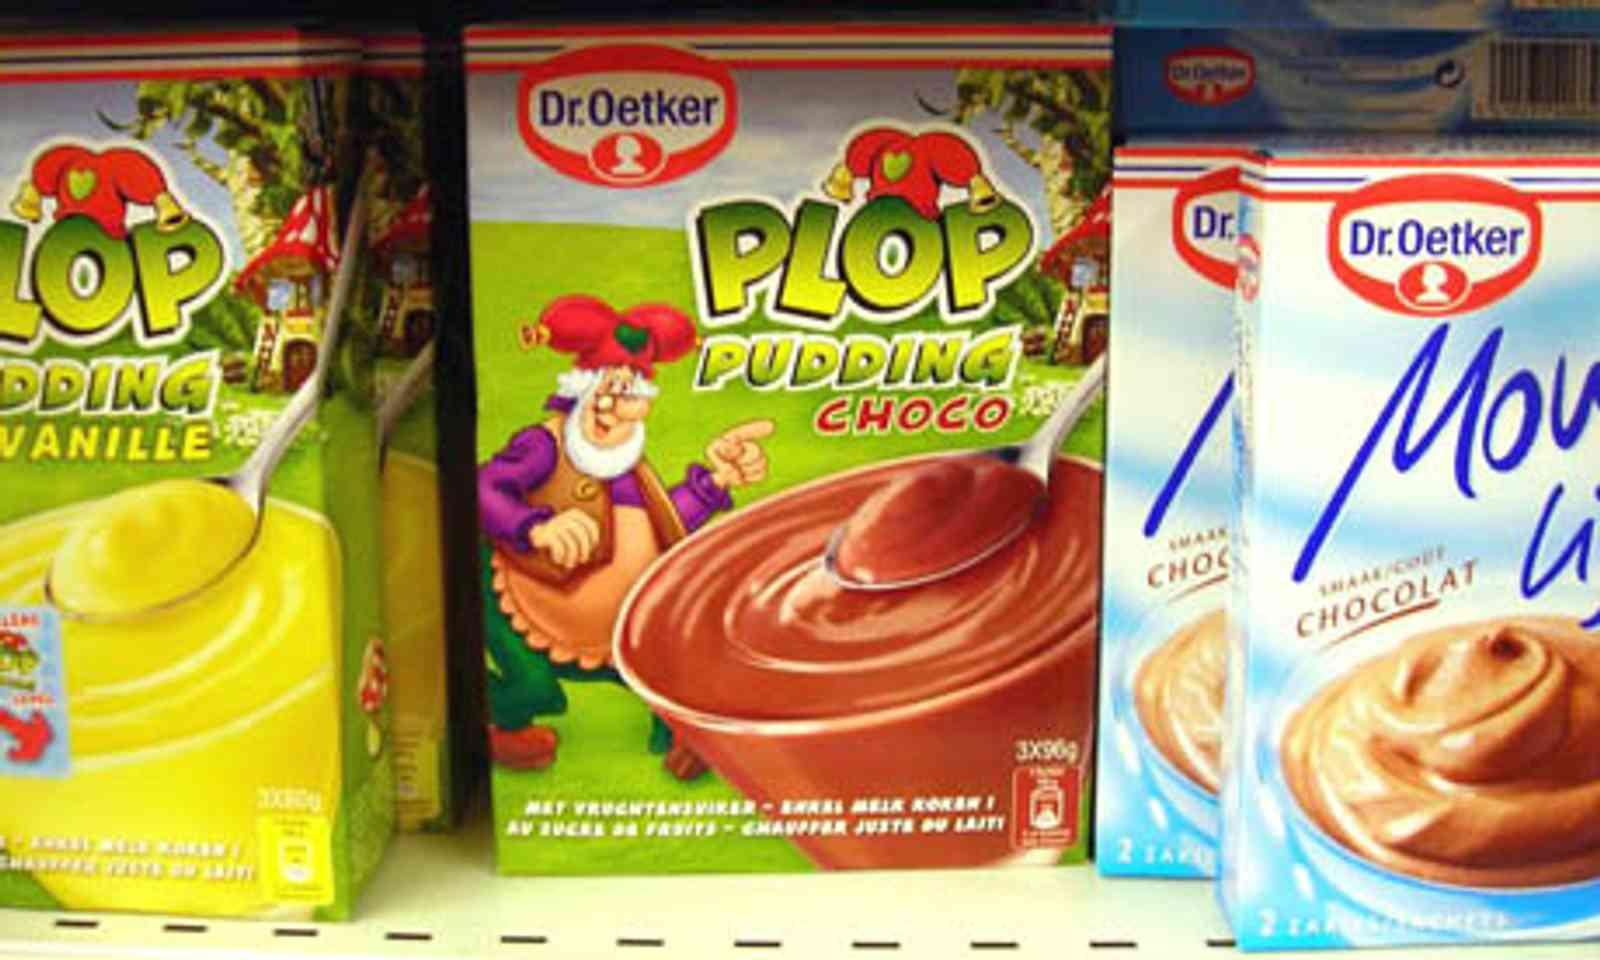 Plop Choco Pudding